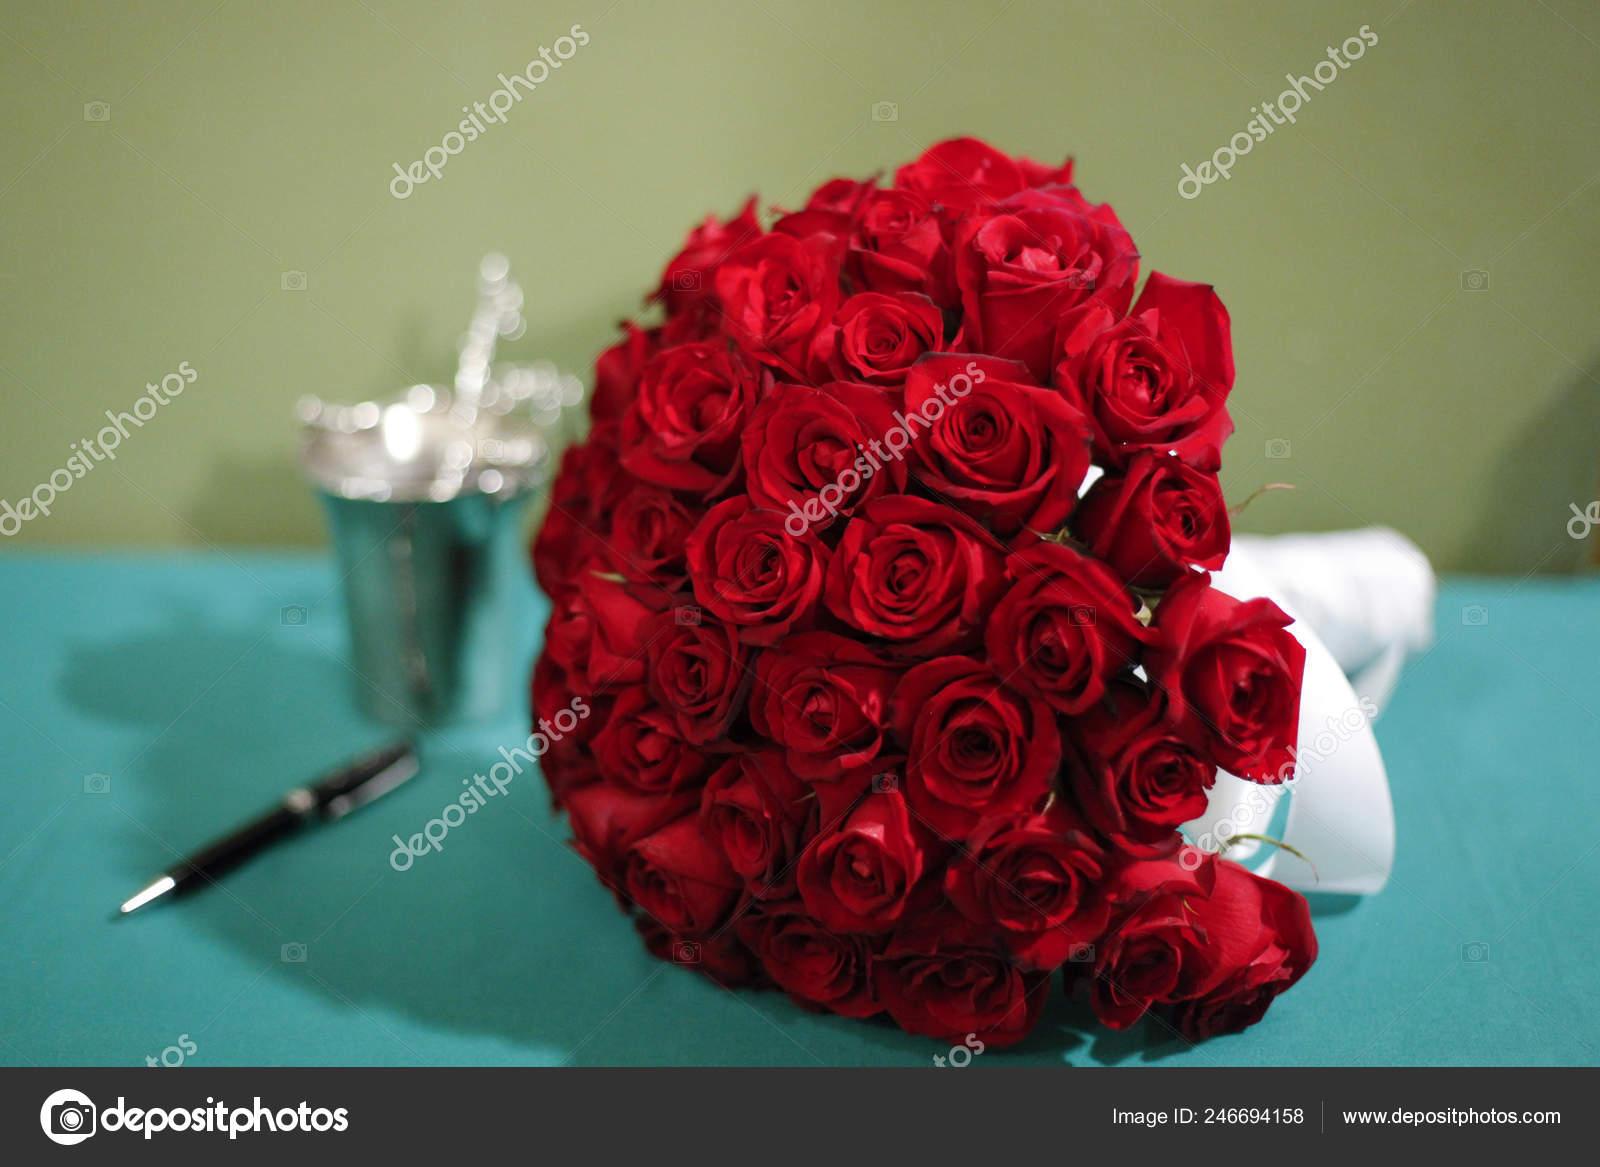 Bouquet Red Roses Arrangement Wedding Detail Brides Red Flowers Stock Photo C Sidneydealmeida 246694158